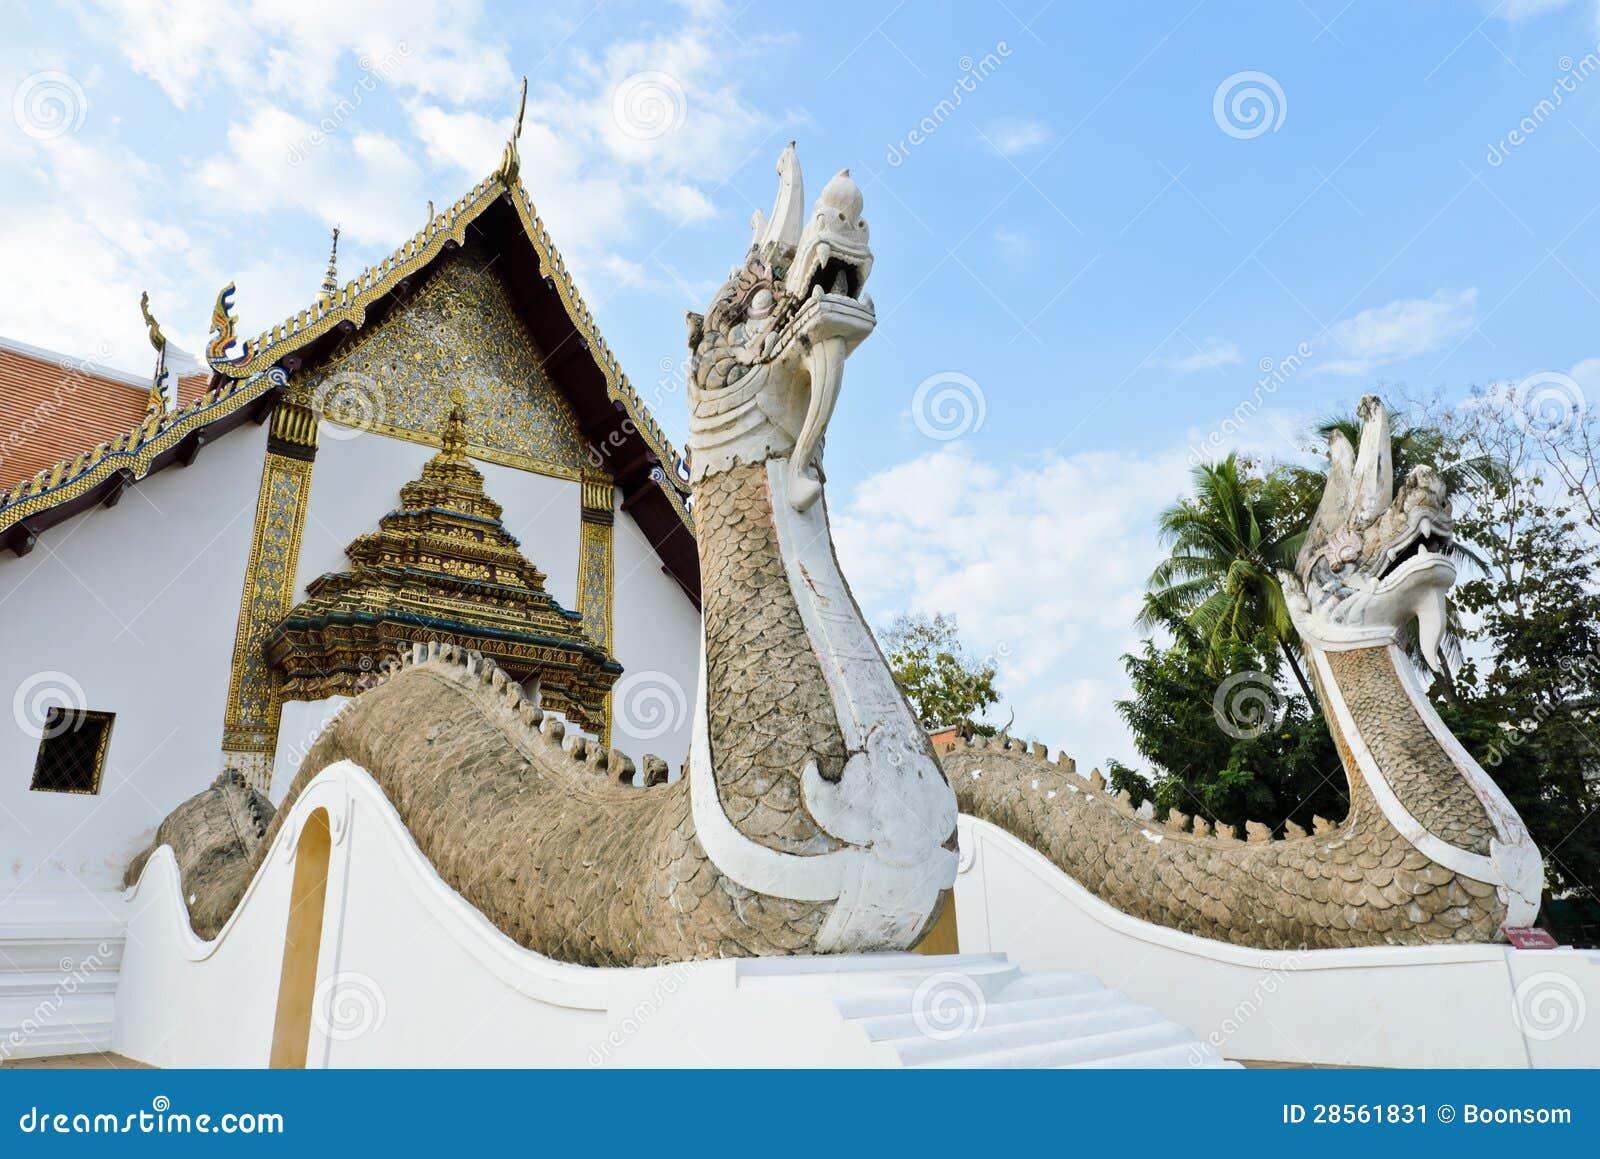 Wat Phumin In Nan, Thailand Stock Image - Image: 28561831